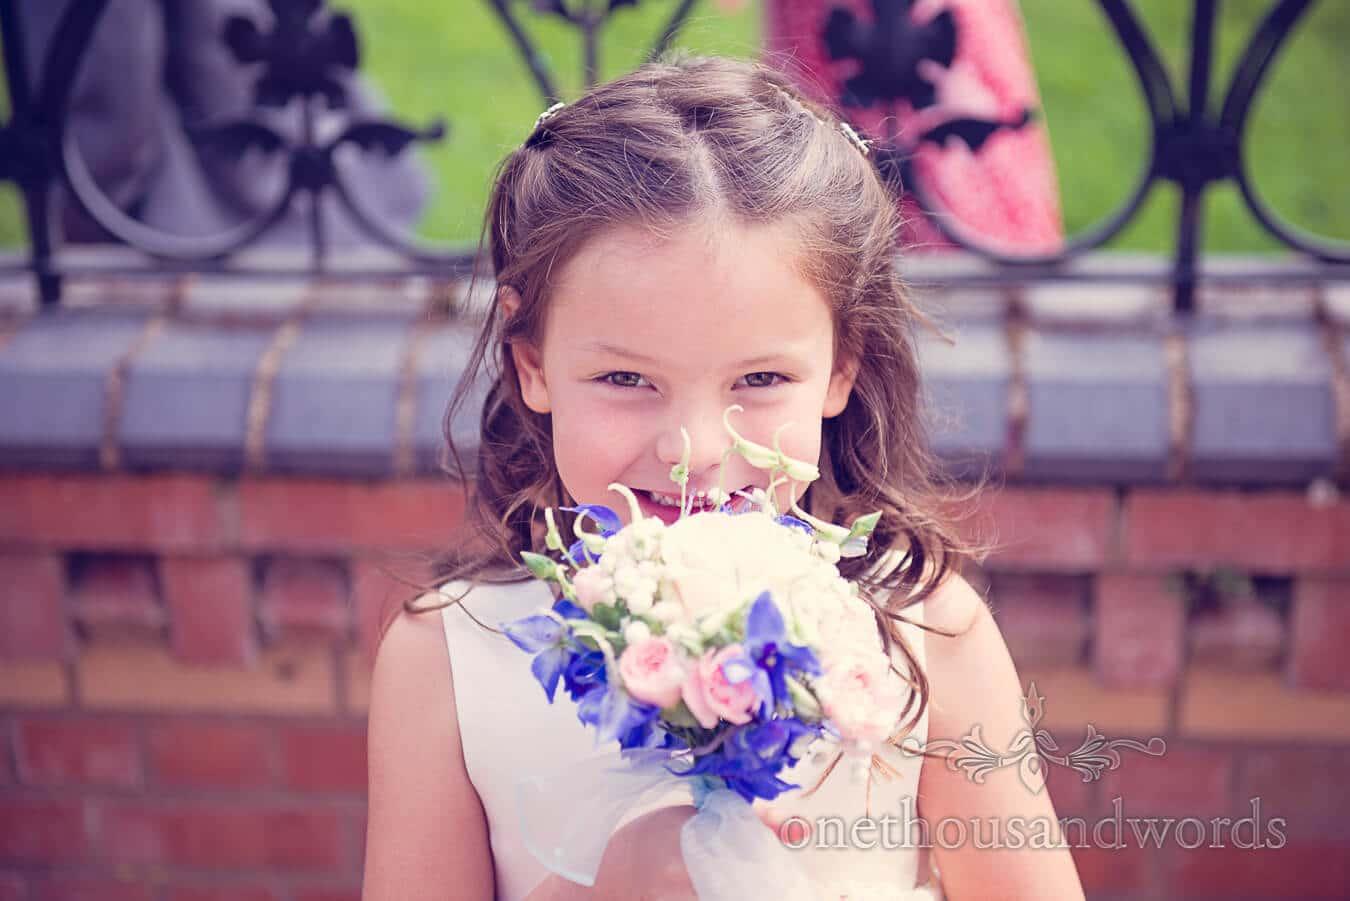 Flower girl portrait photograph with wedding bouquet